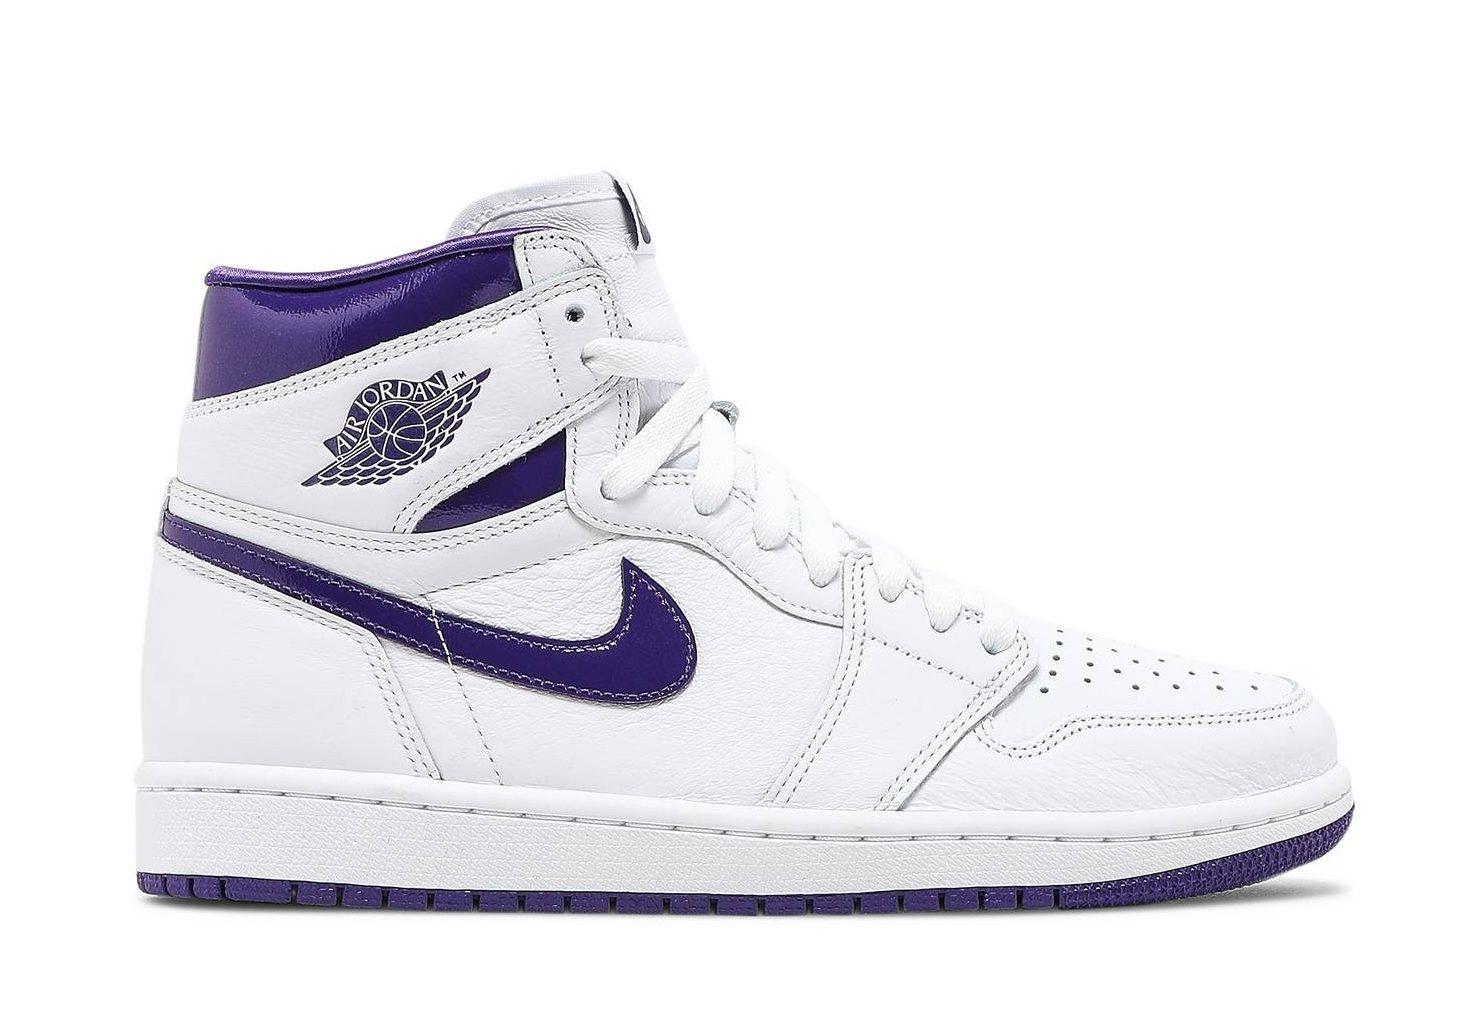 Krossovki-Air-Jordan-1-White-Court-Purple-e1630239881362